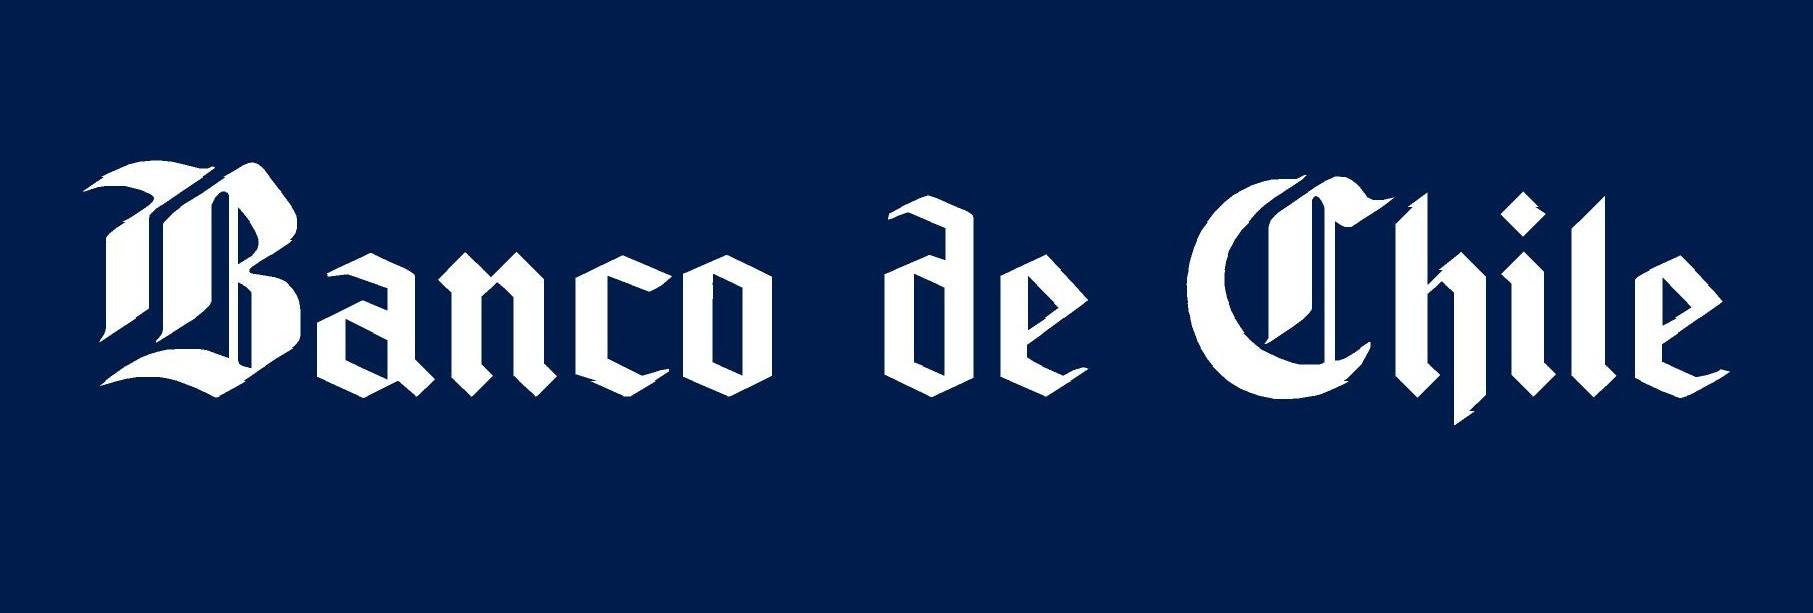 Comparativa bancos: Banco de Chile